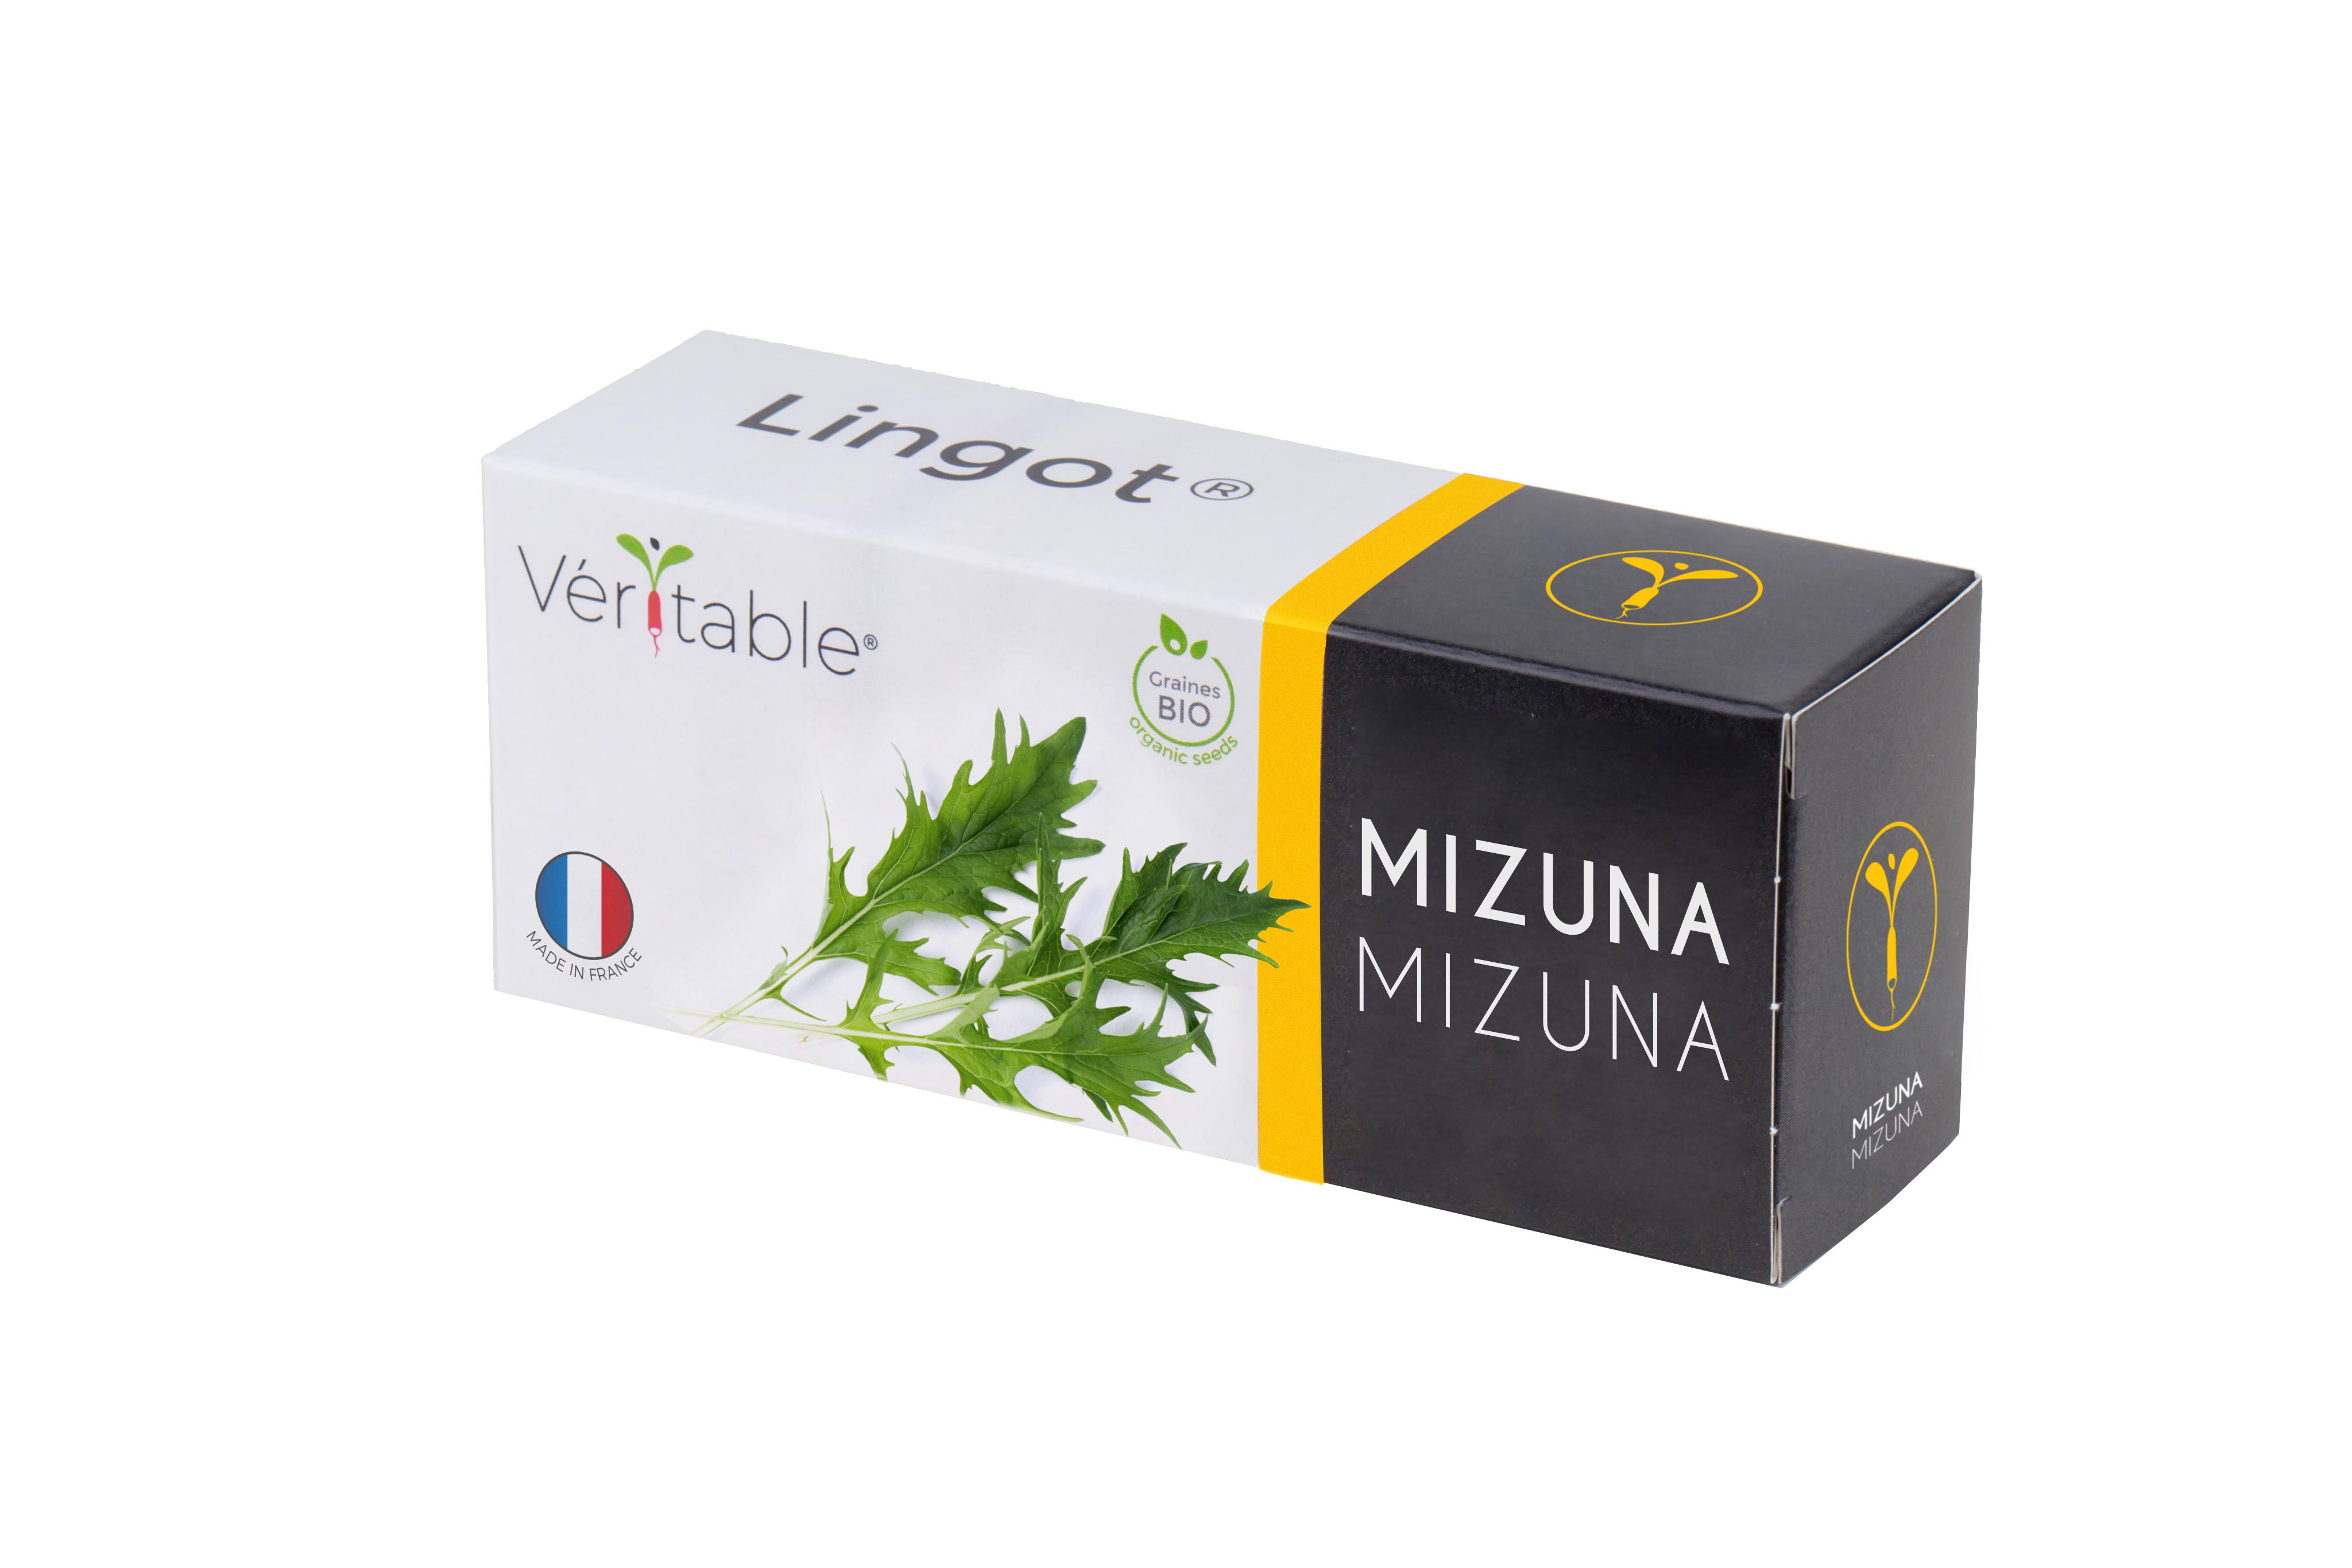 Lingot® Mizuna BIO compatible potager Véritable® et Exky®